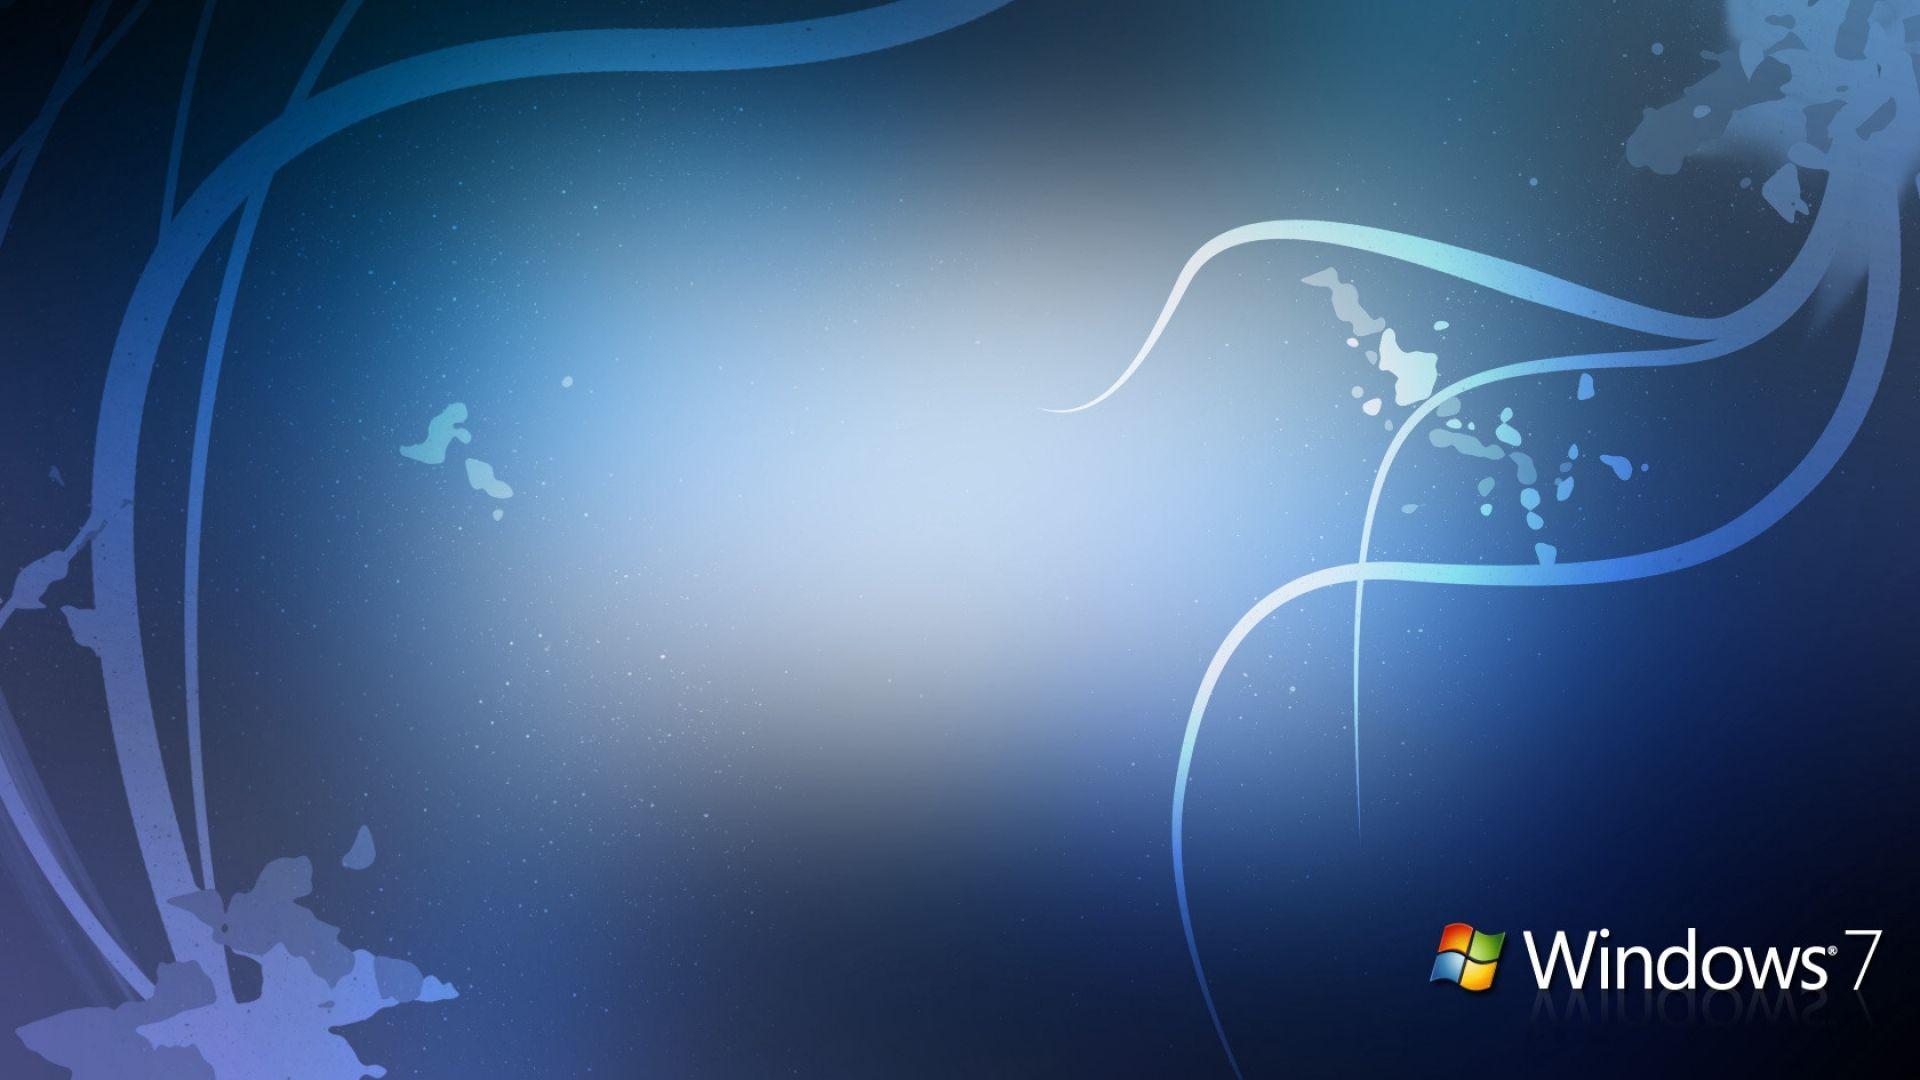 windows ultimate bright black hd desktop wallpaper widescreen | hd